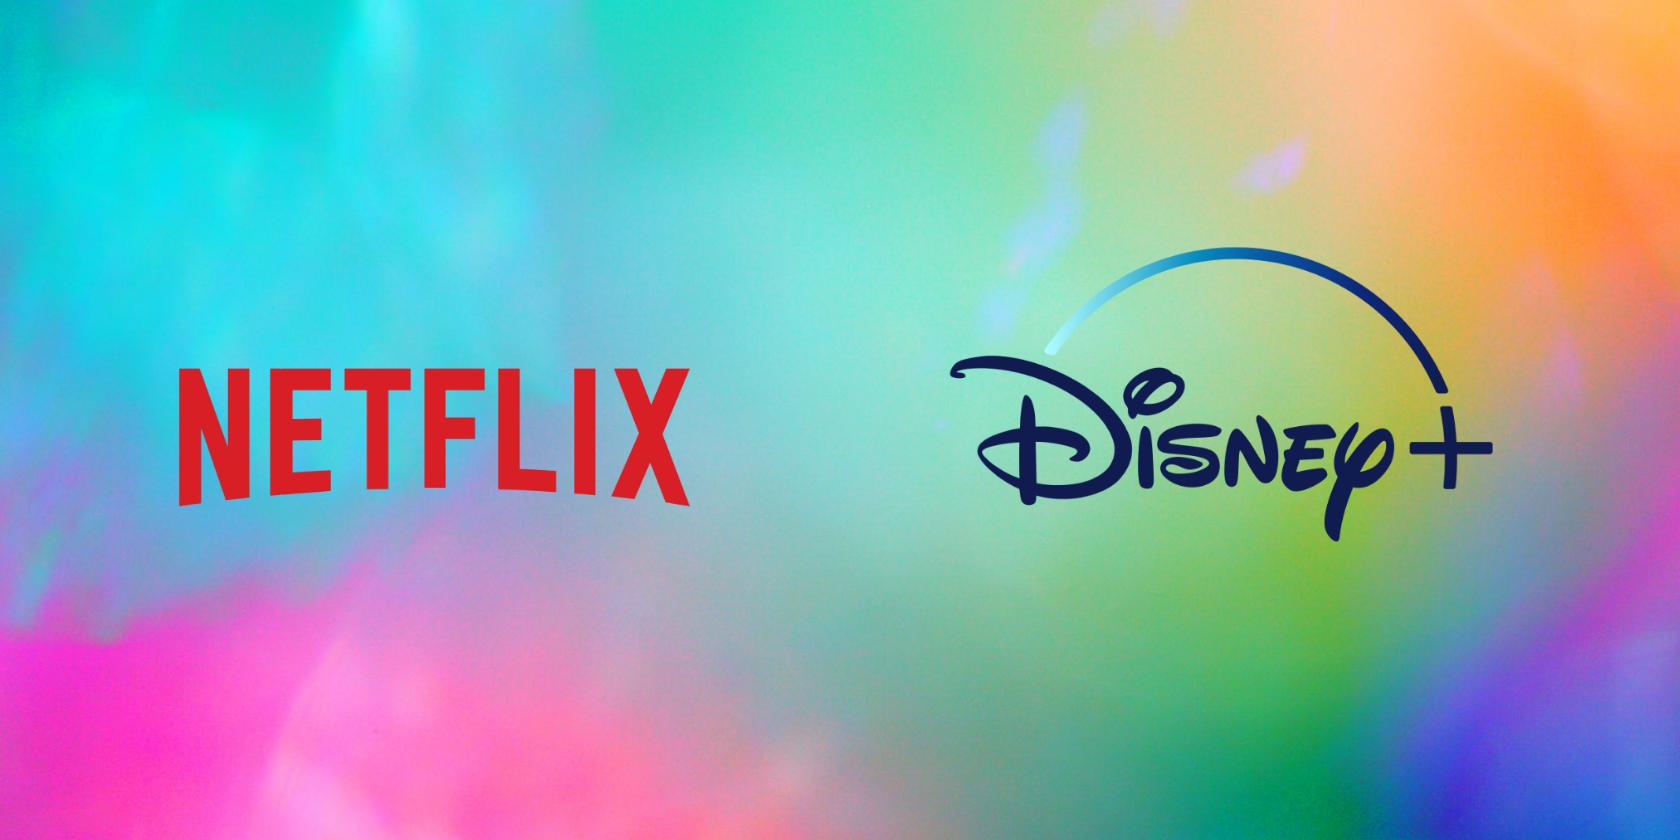 Netflix vs. Disney+: Which Is Better?